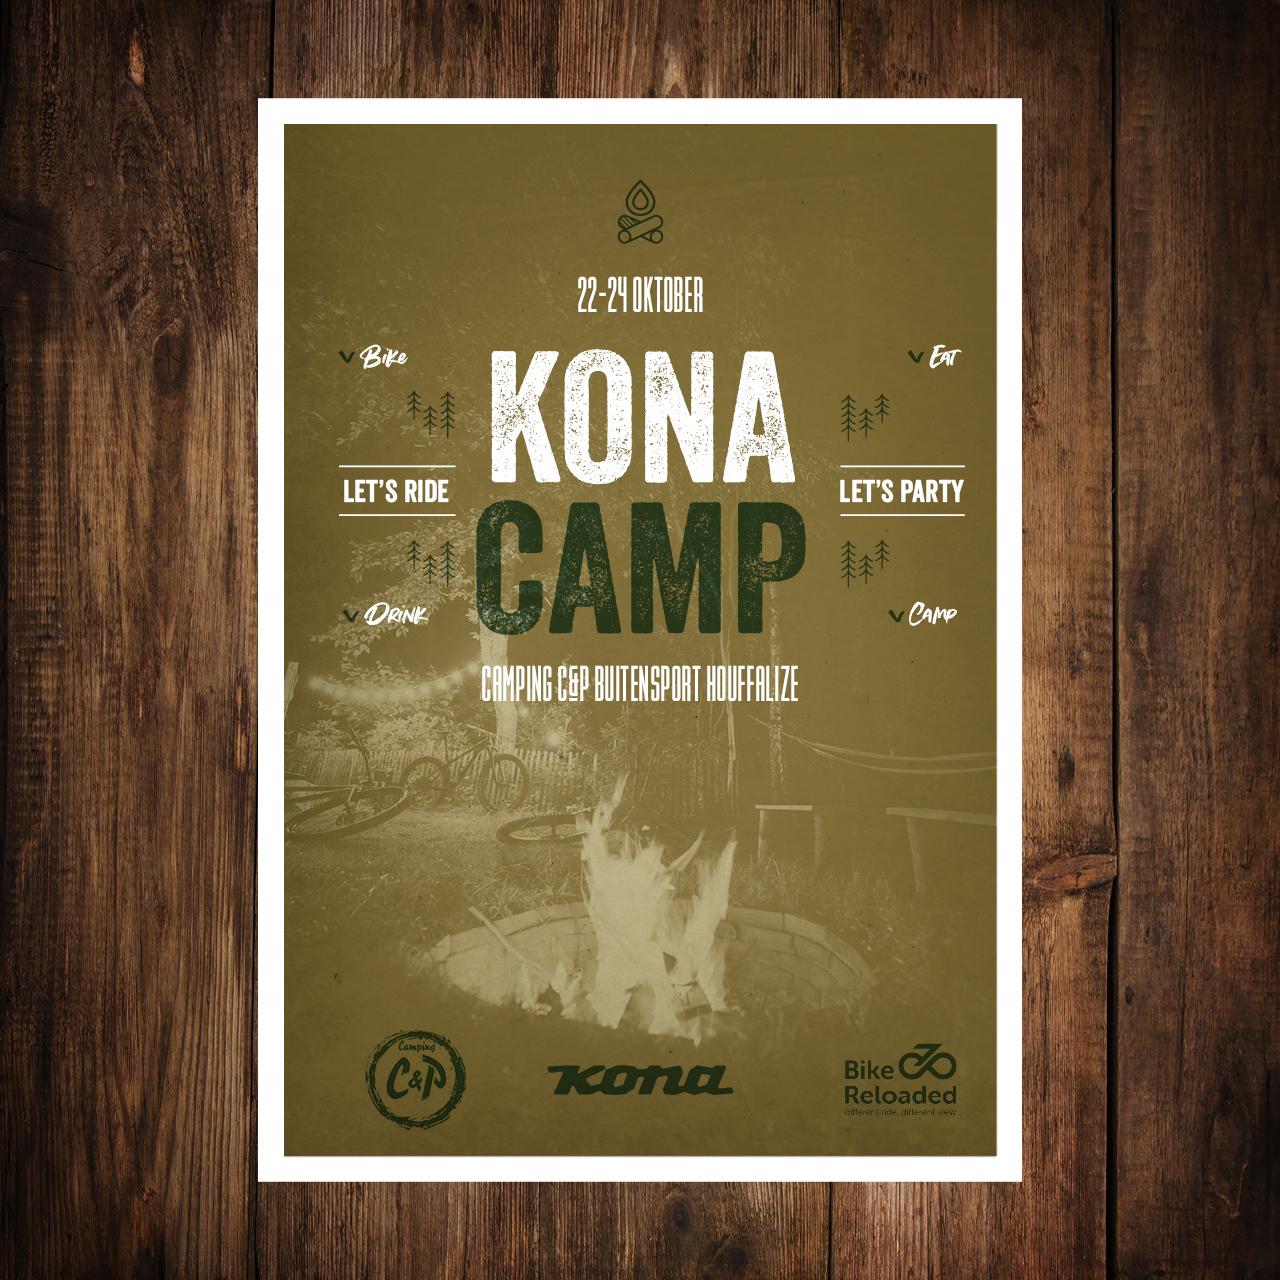 Kona Camp 22 - 24 oktober